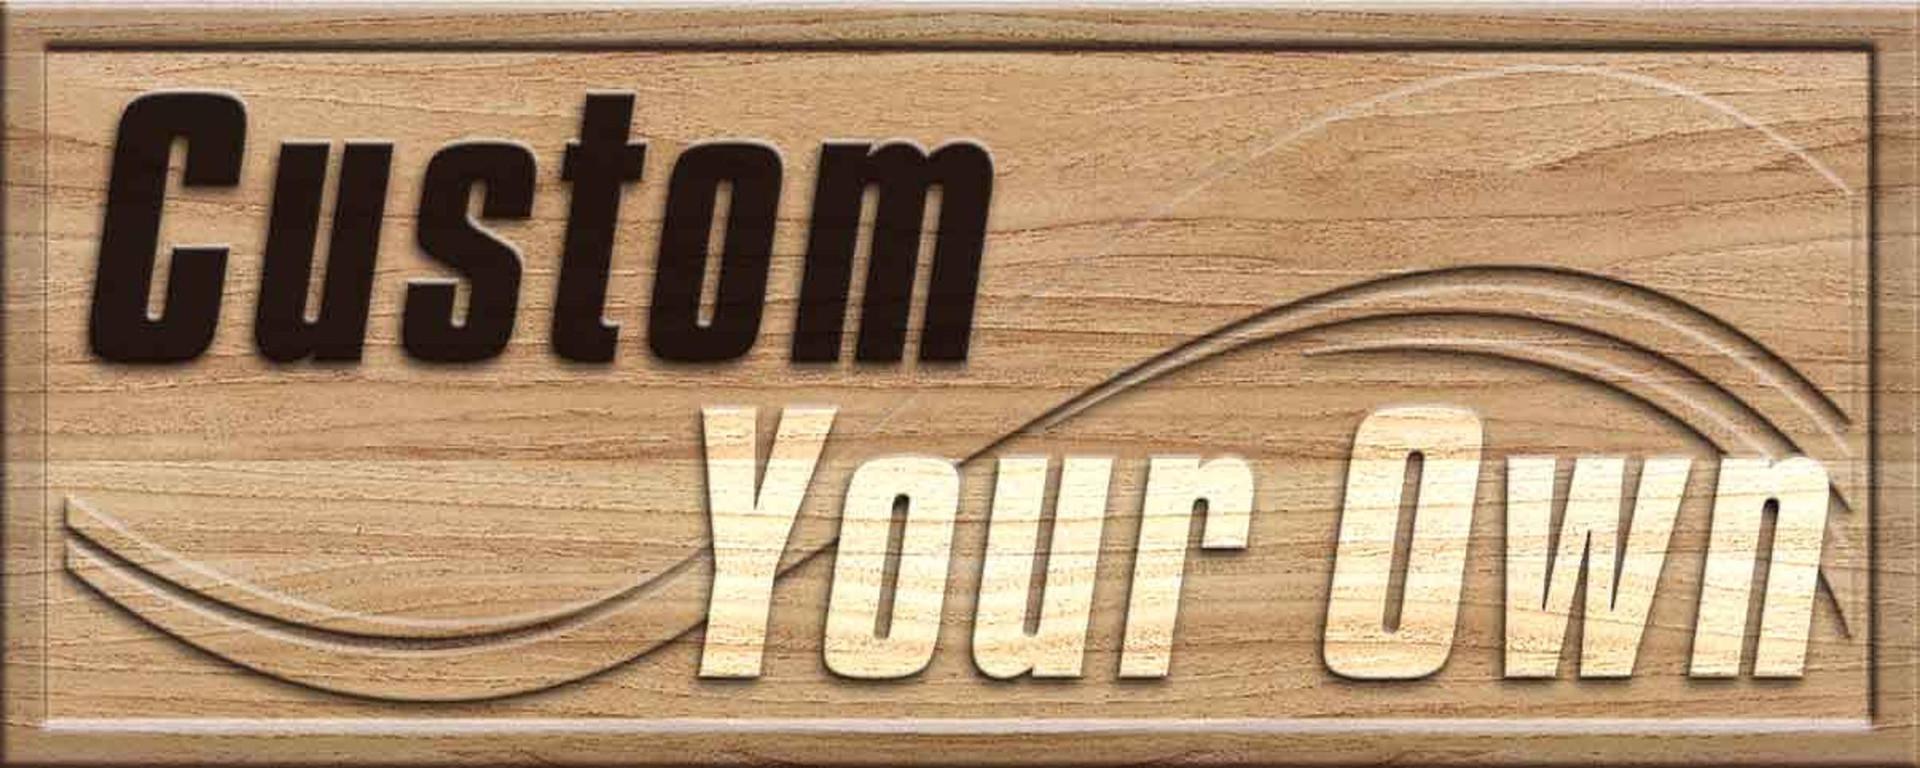 custom-wood-sign-design-your-own-3d-wood